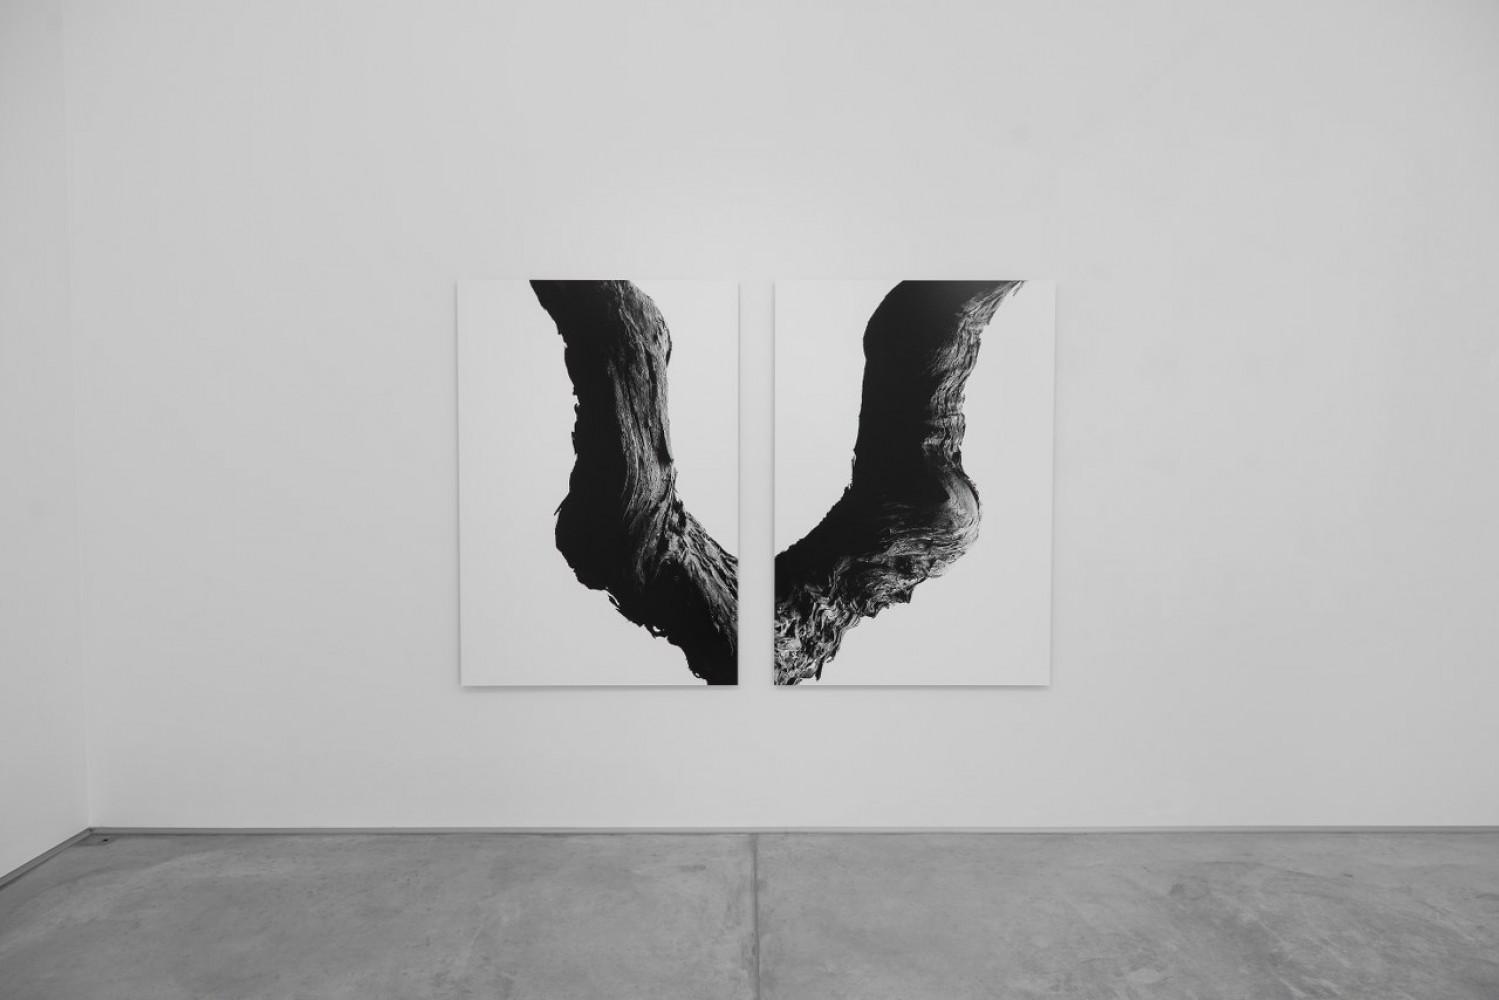 Marco D'Anna, 'OLTRE/N.10 (diptych)', 2016